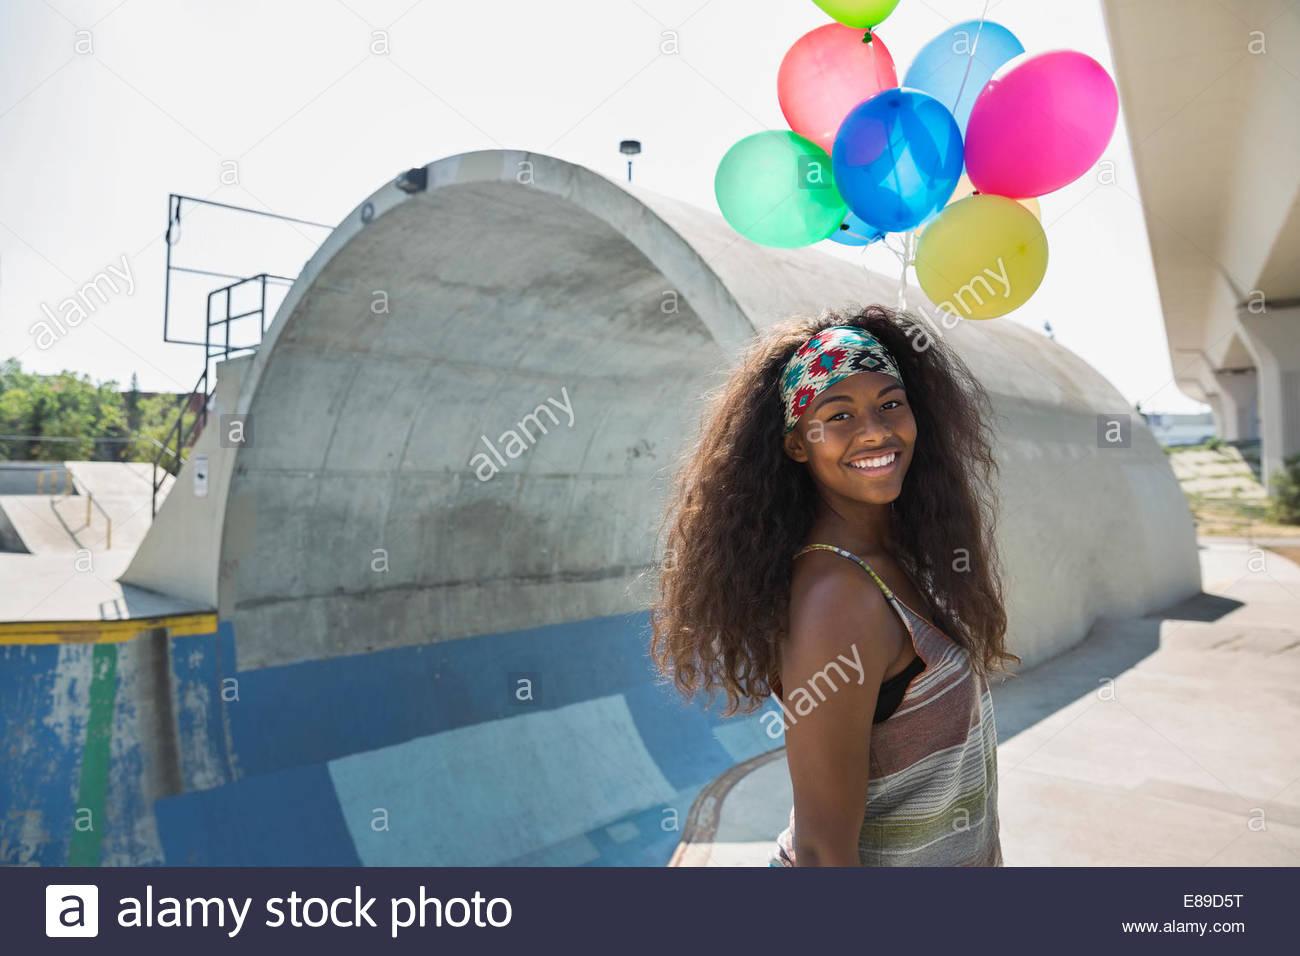 Teenager-Mädchen mit Luftballons an Skateboard-park Stockbild